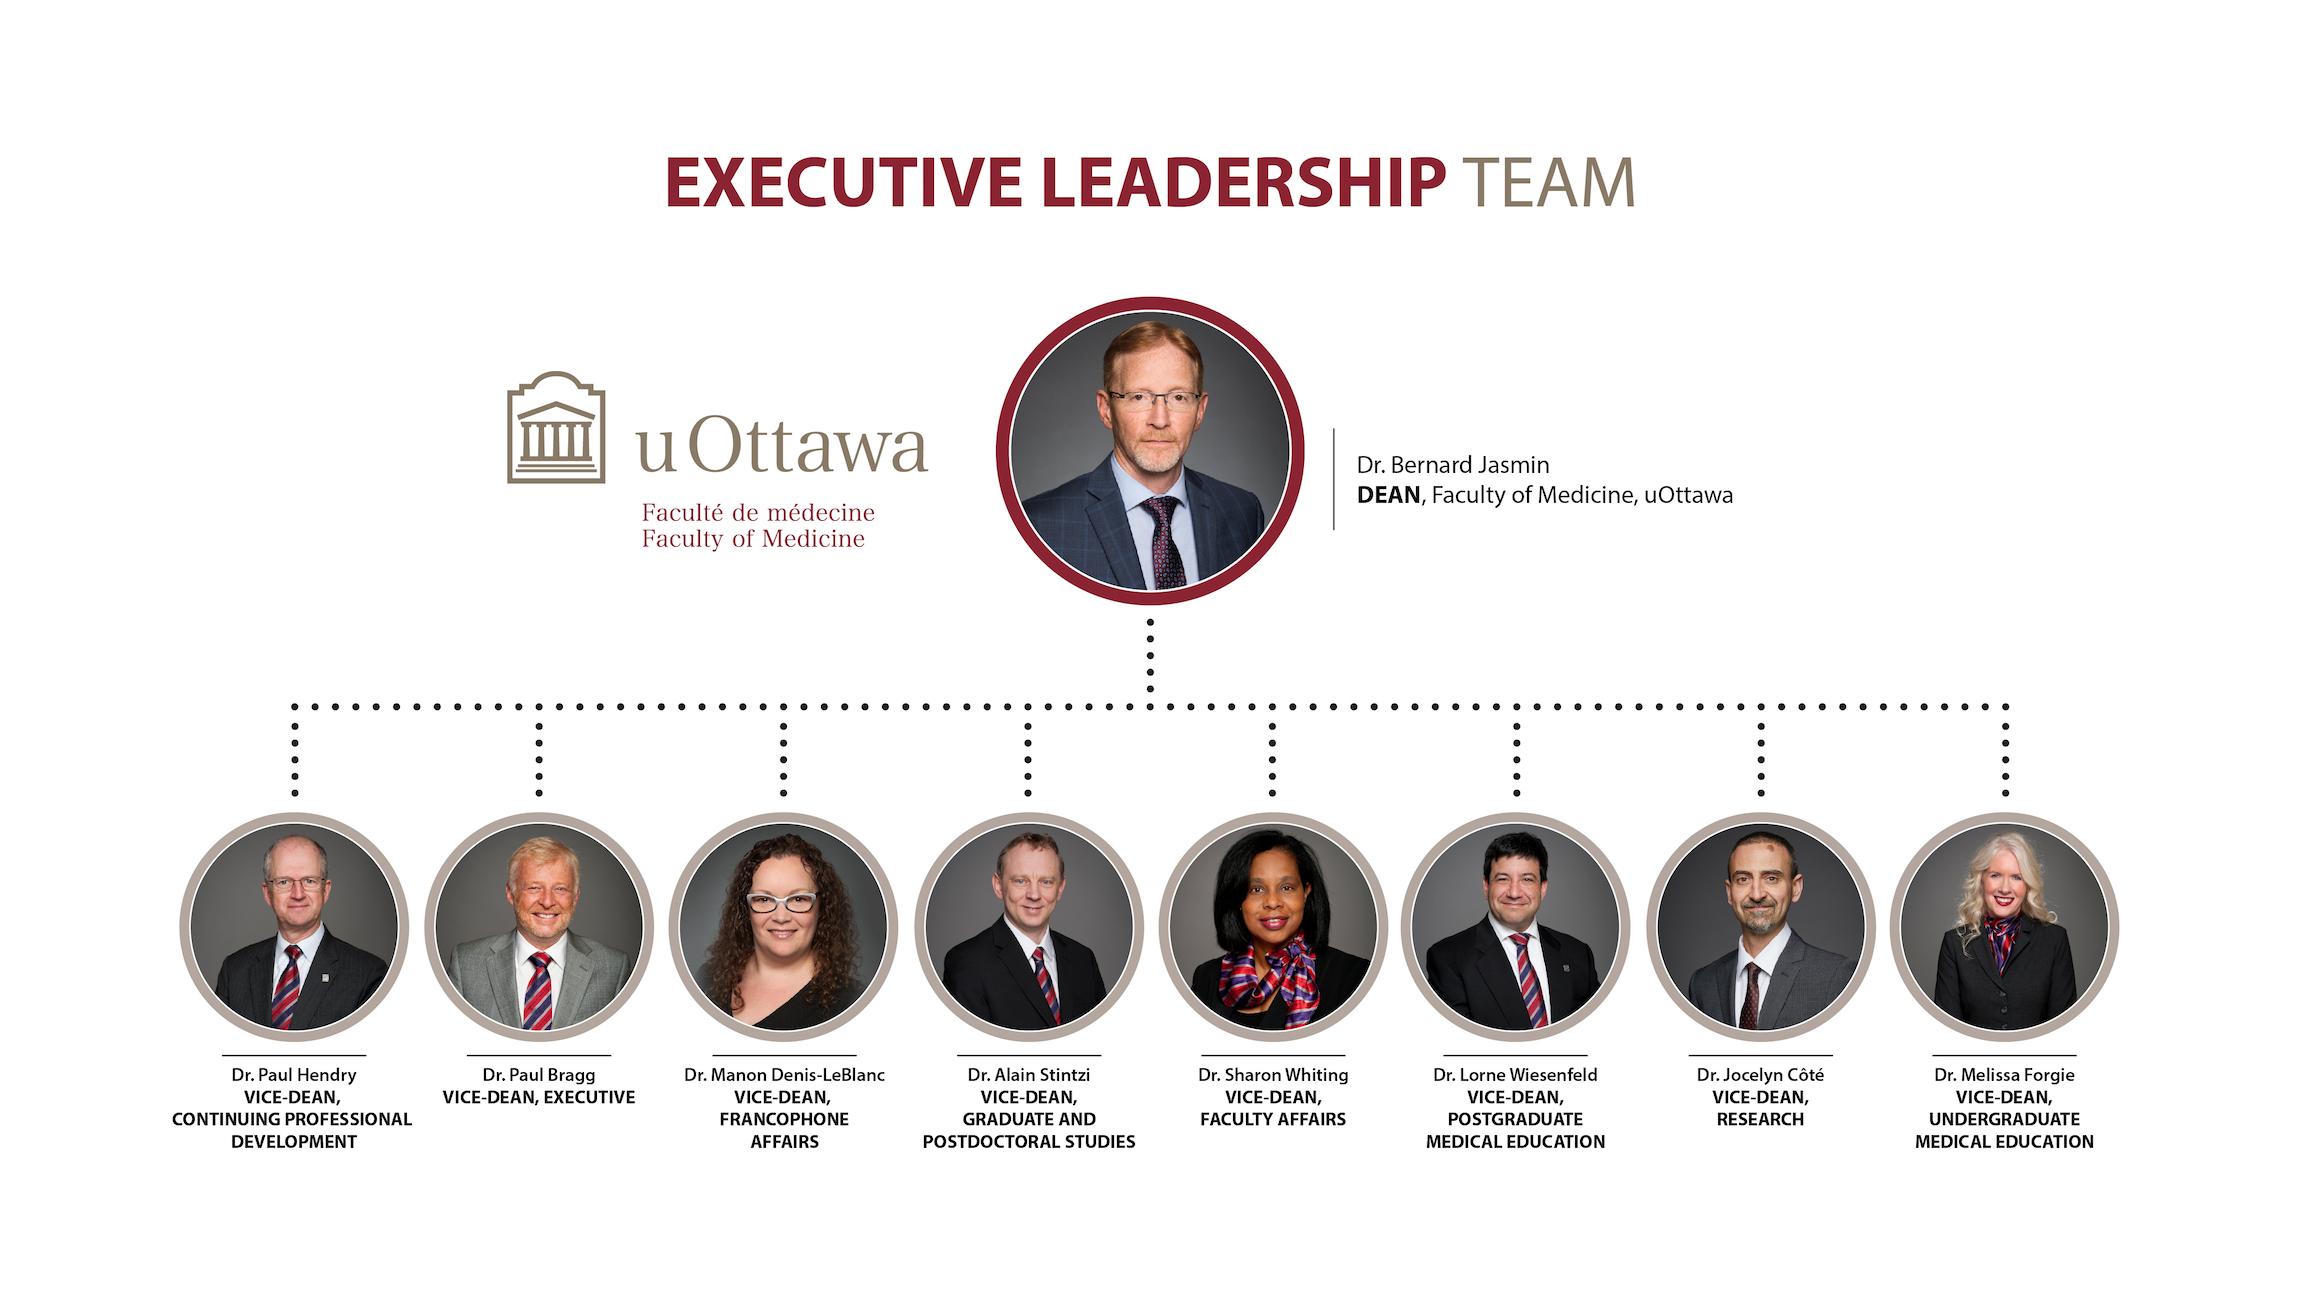 Executive Leadership Team Organizational Chart